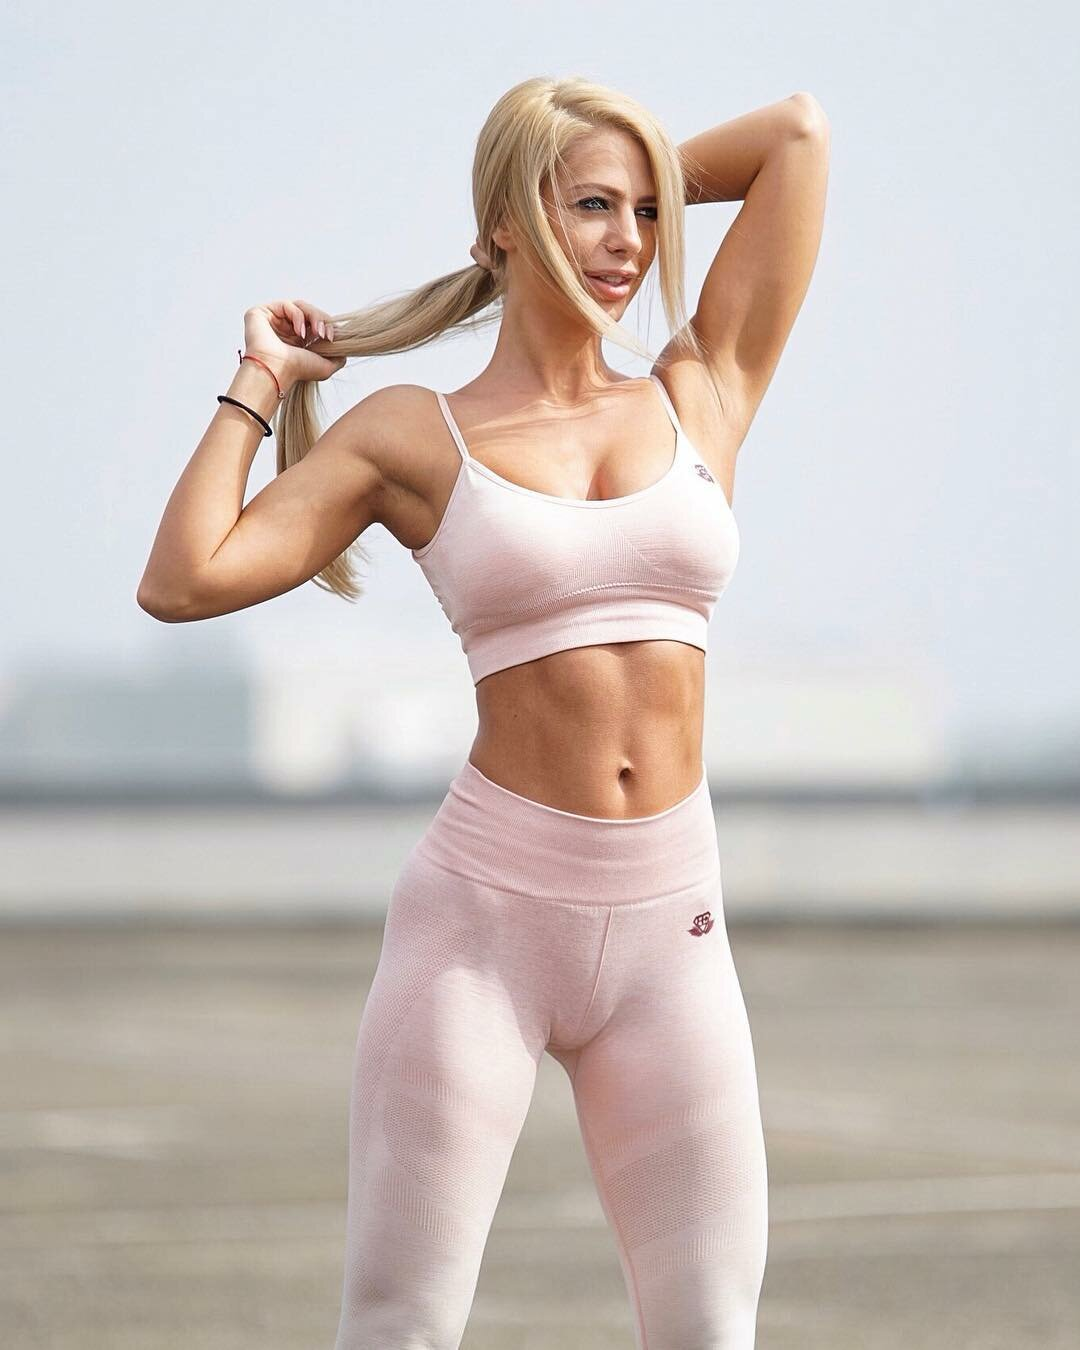 bodybuilder-cameltoe